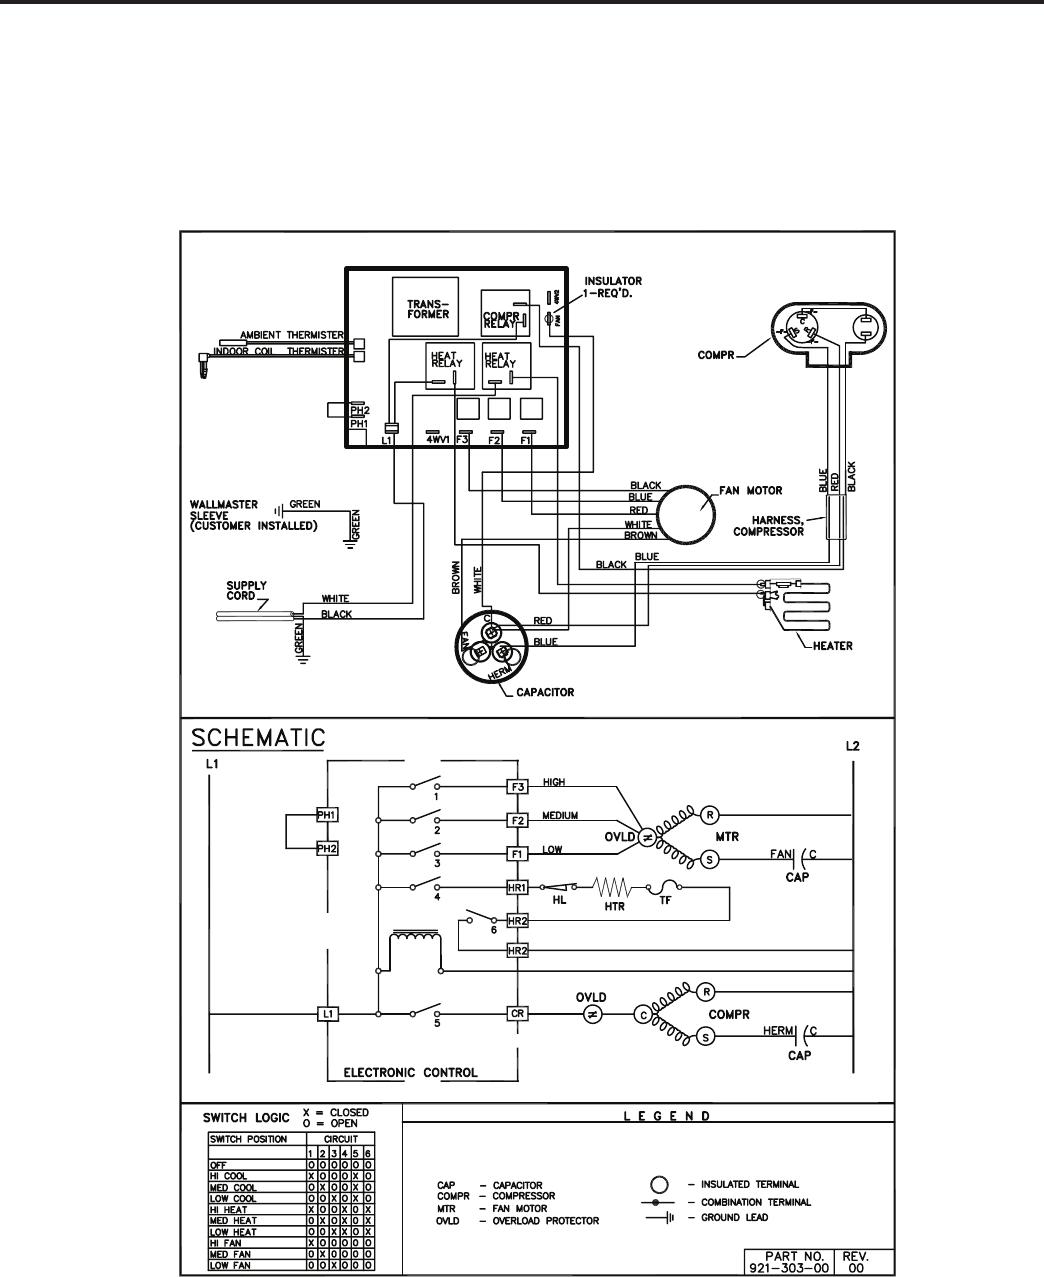 Friedrich Wallmaster Ws10b10 Users Manual P2kpd 1 05 Window Unit Wiring Diagram